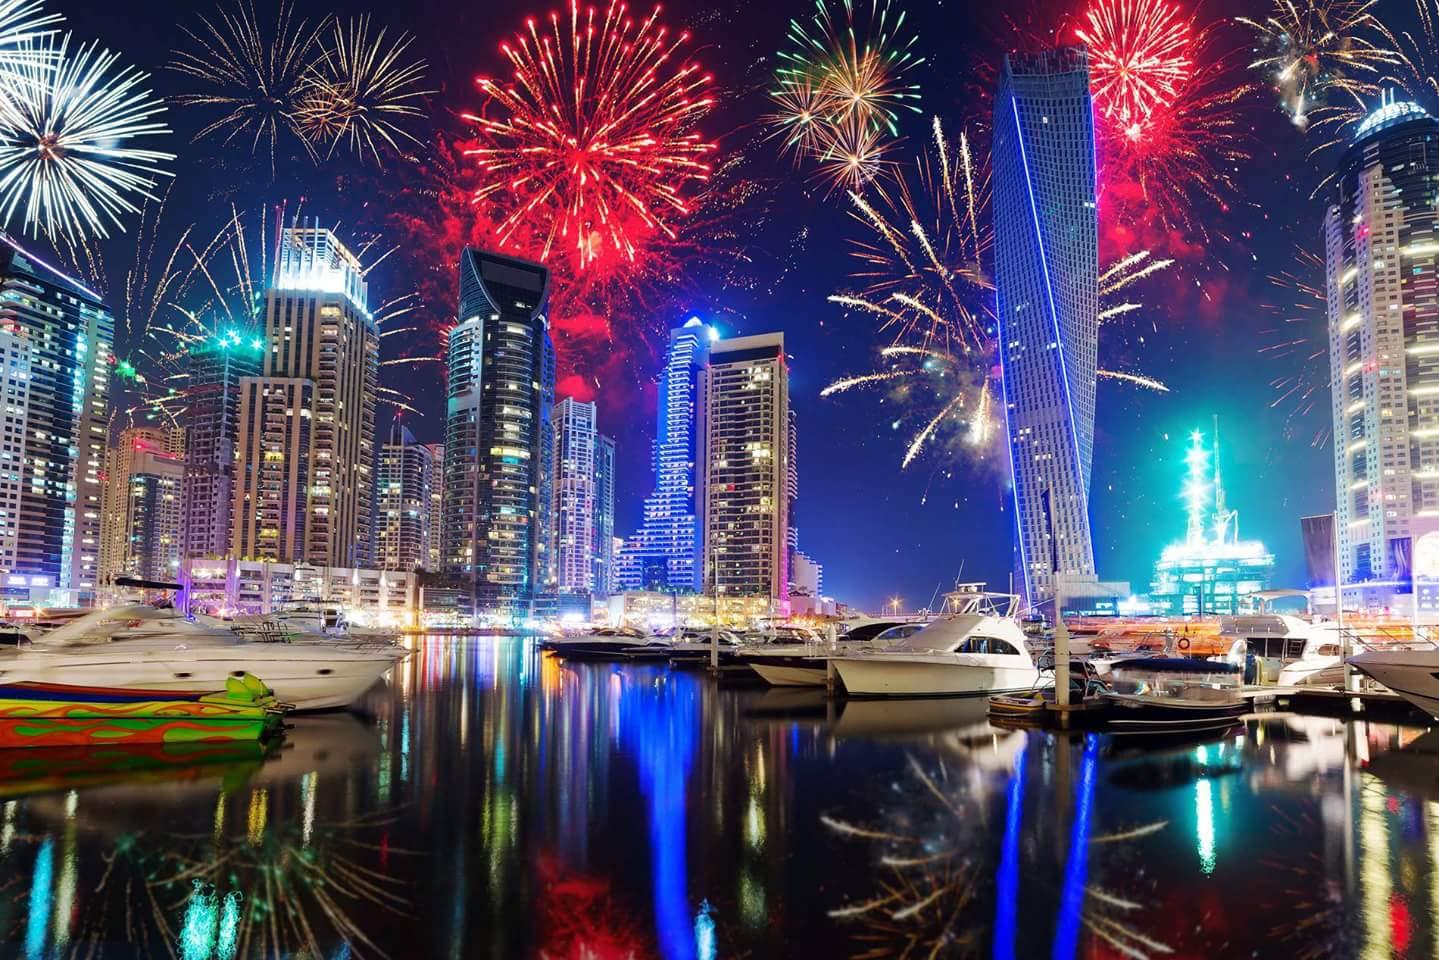 UAE counts down to its biggest fireworks display – Destination My Dubai